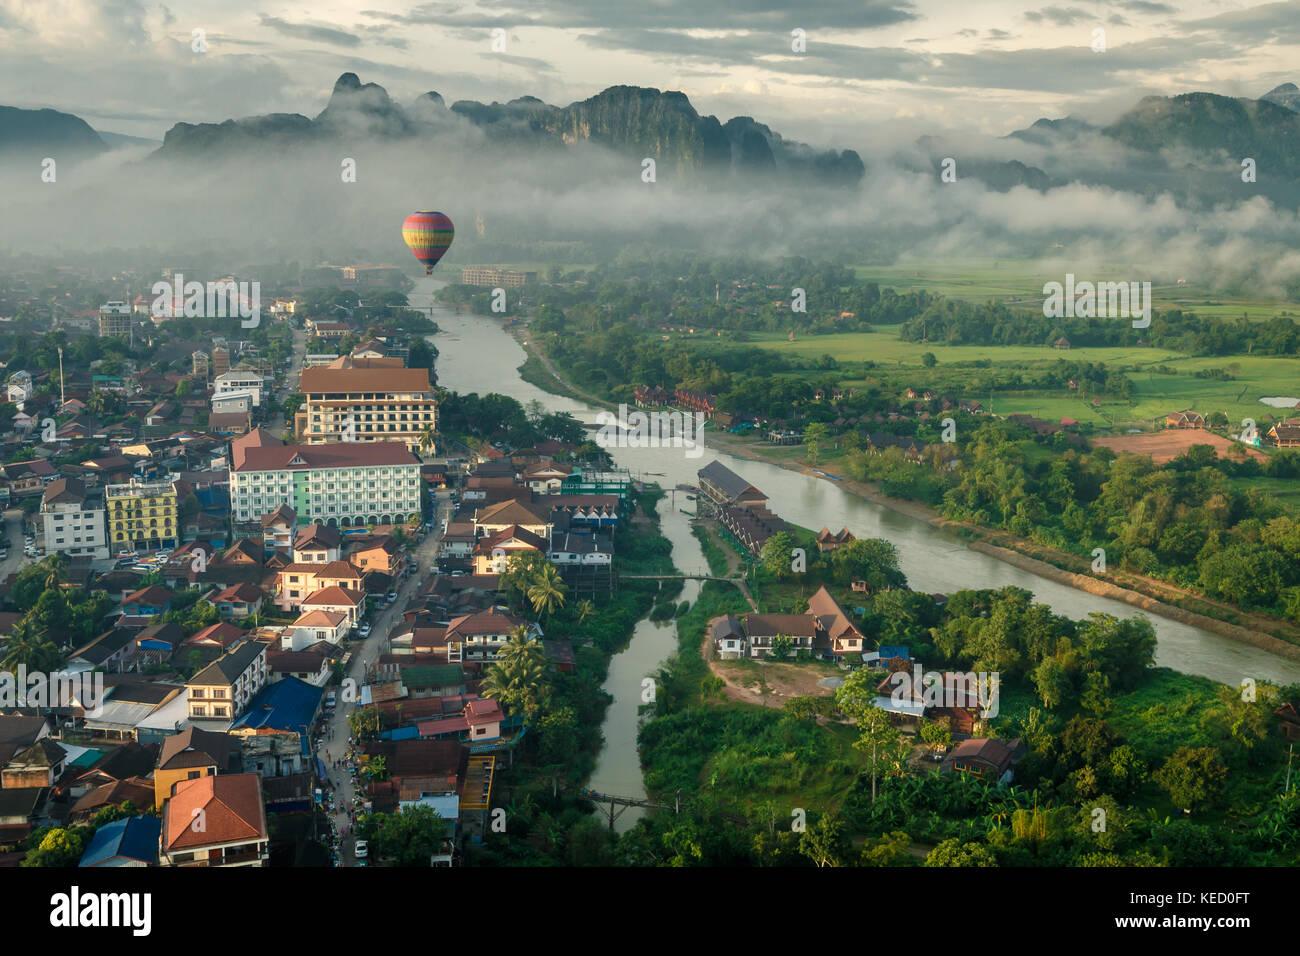 Morgen Ansicht von Vang Vieng, nordlaos. Stockbild